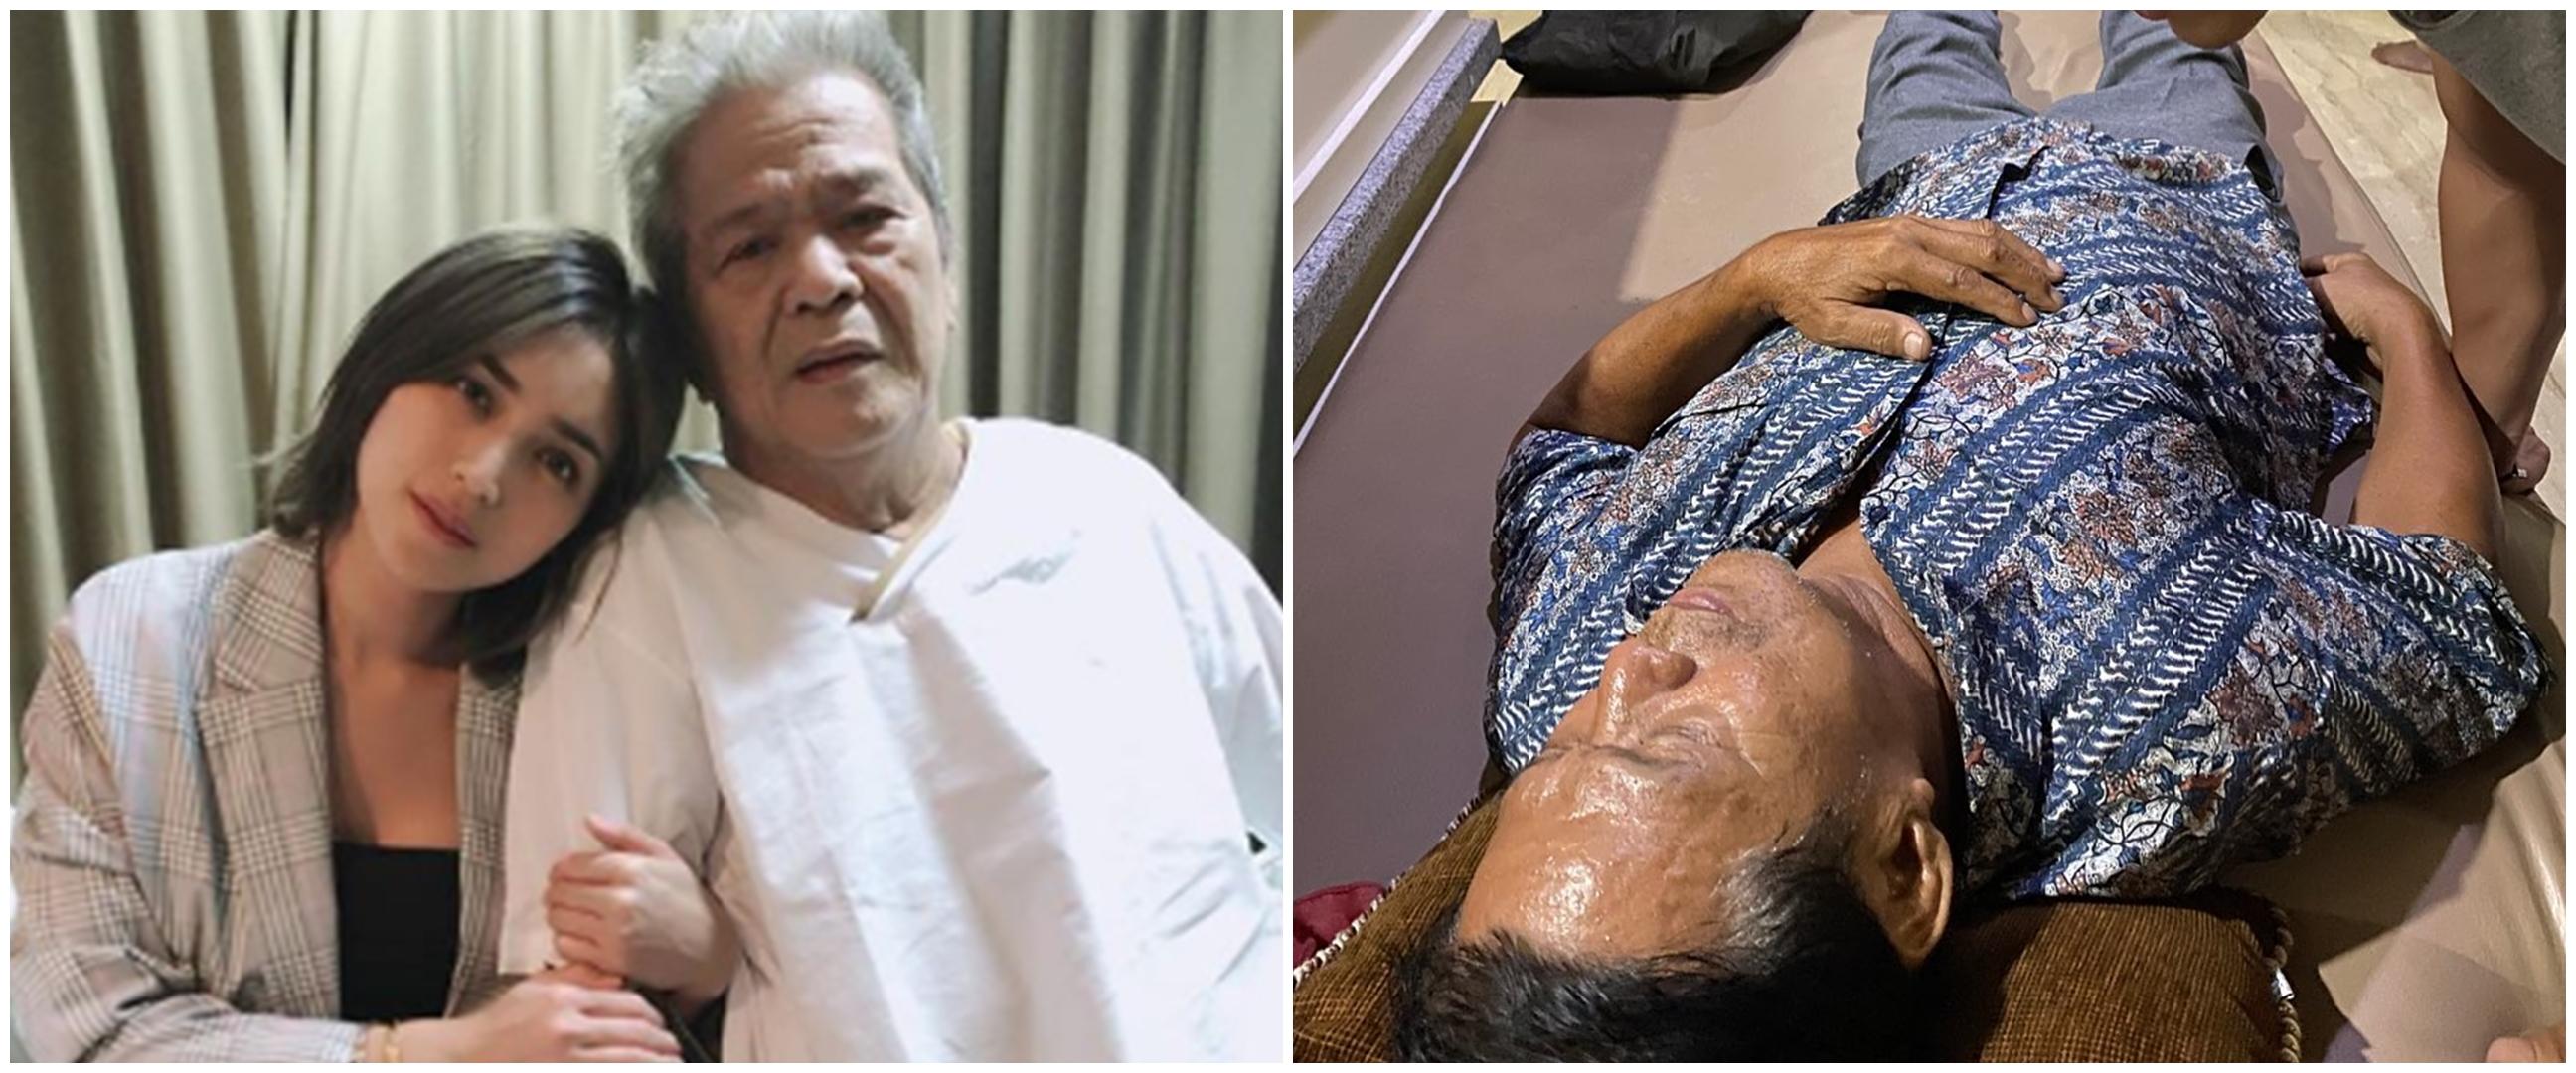 Jadi korban tabrak lari, begini kondisi ayah Jessica Iskandar